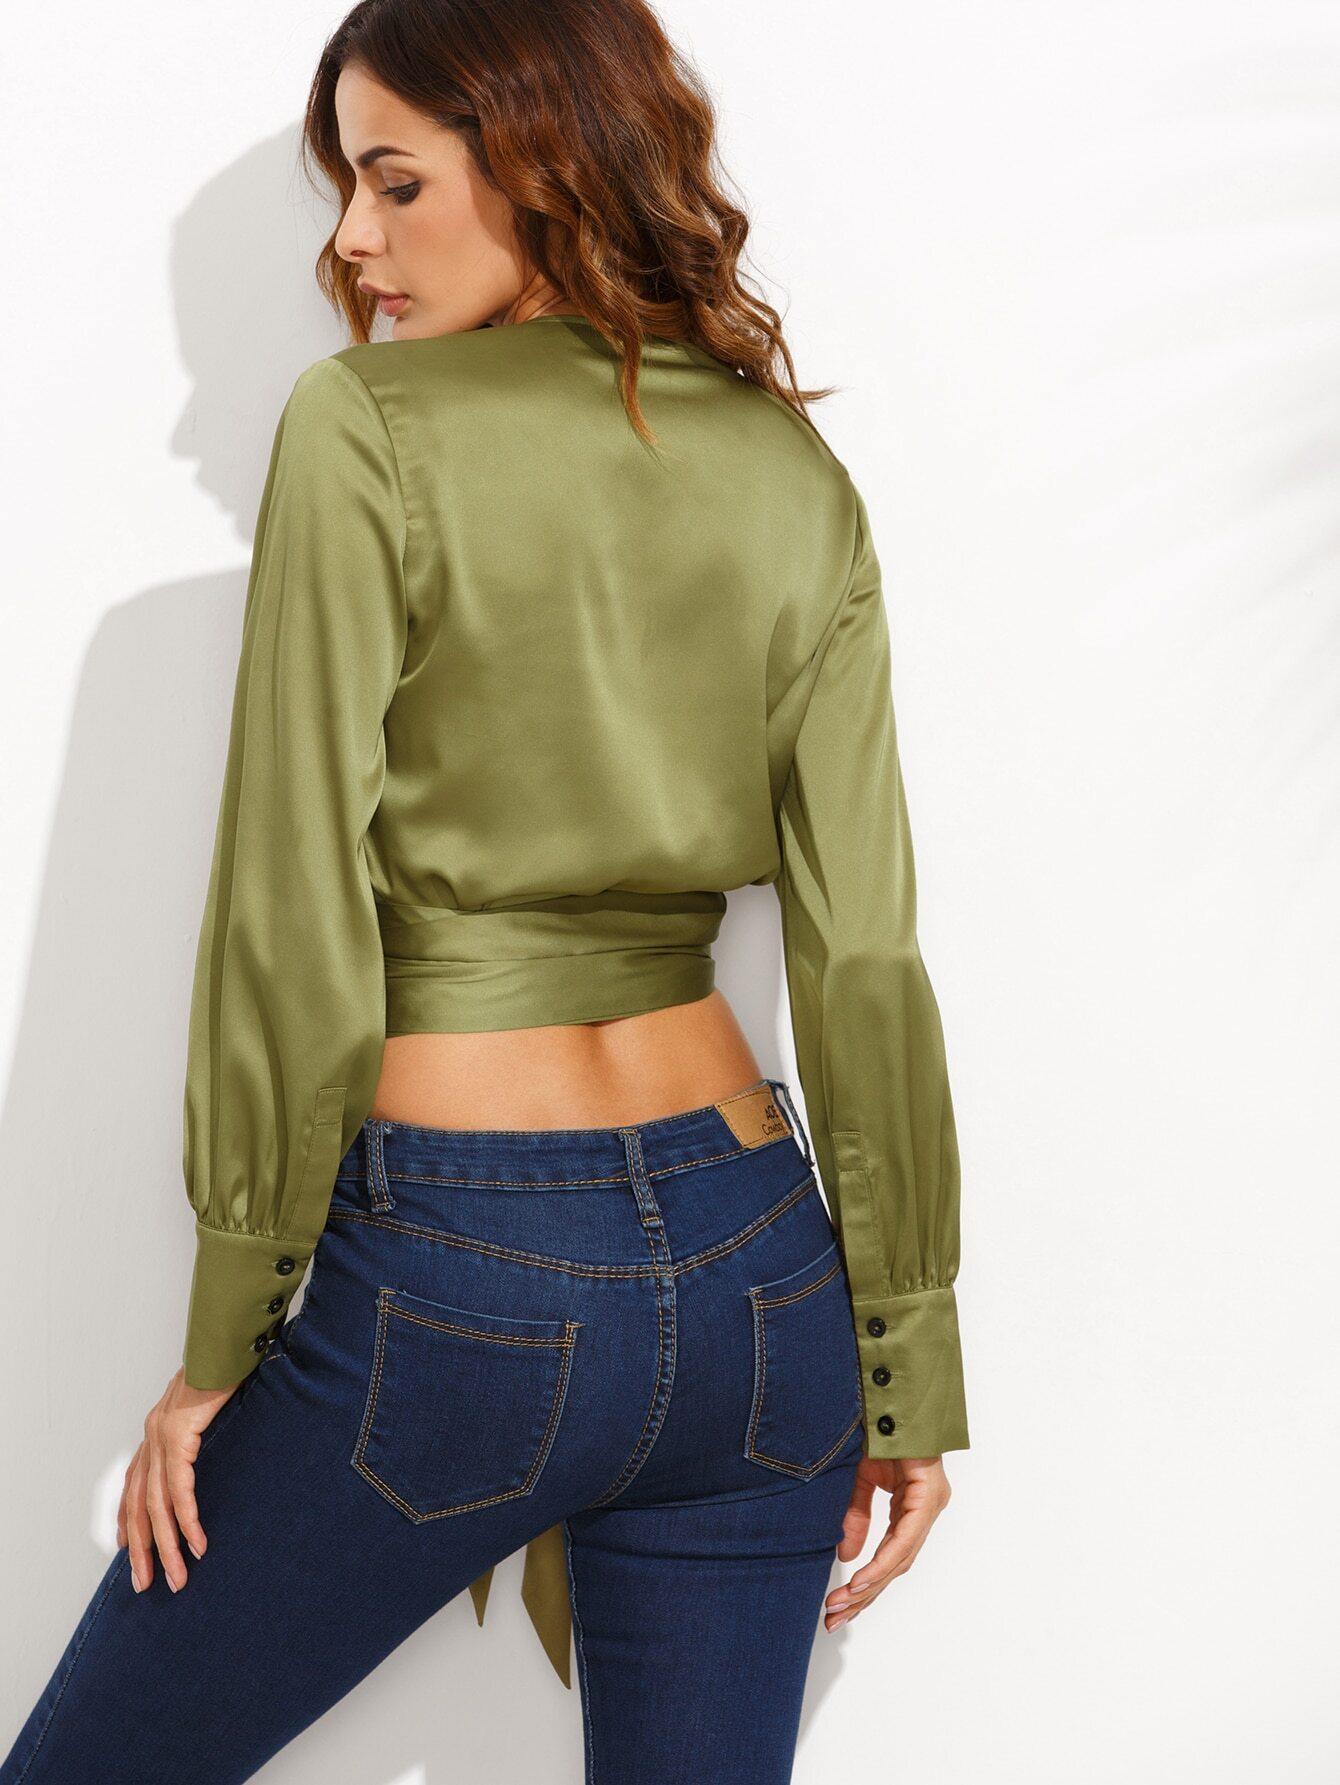 blouse160810701_2